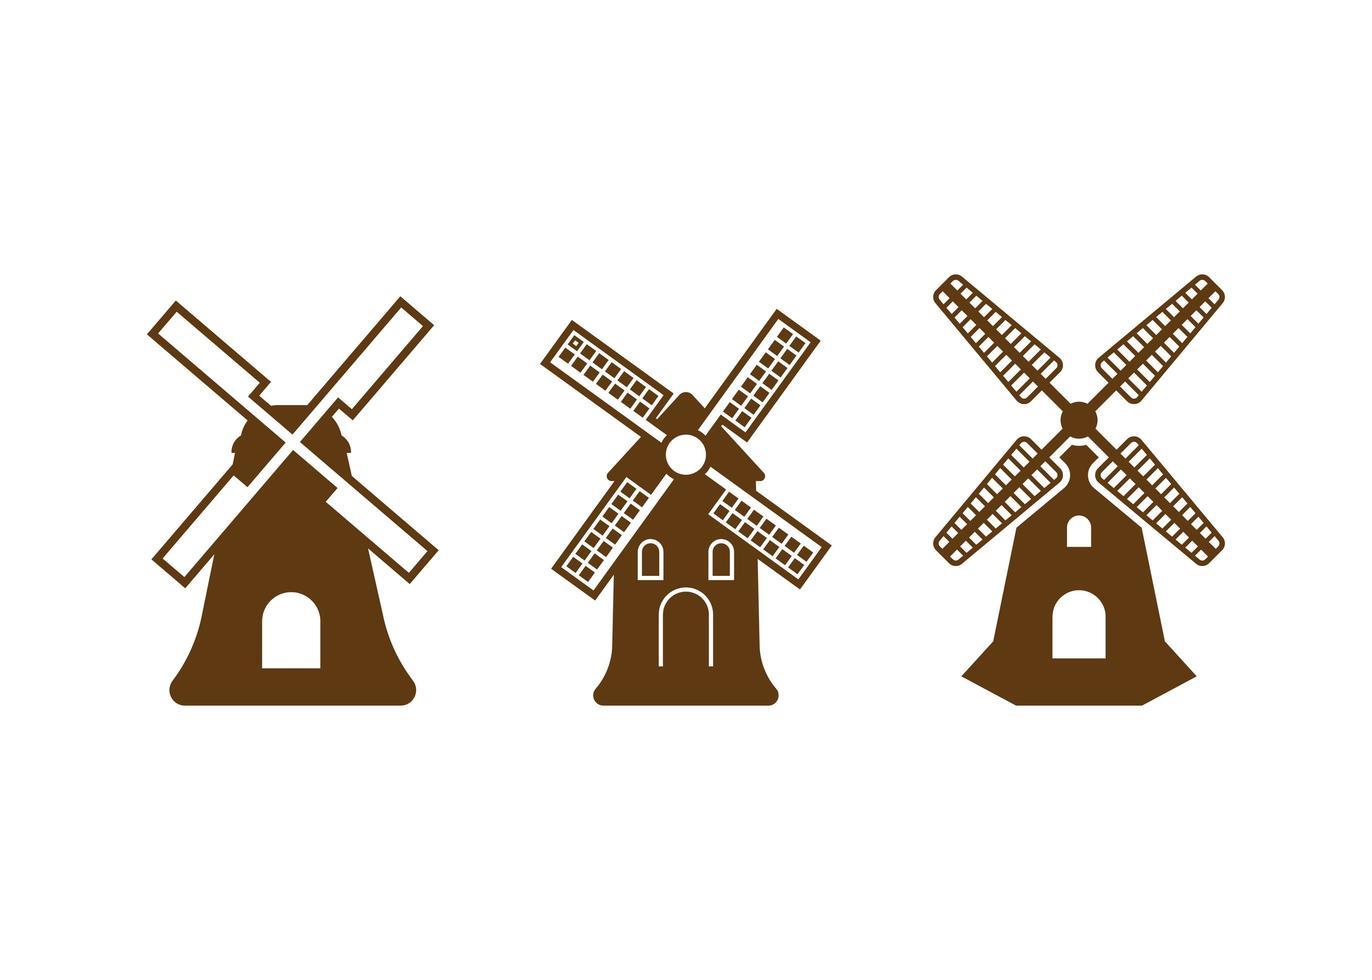 Windmühle Symbol Design Vorlage Vektor isoliert Illustration